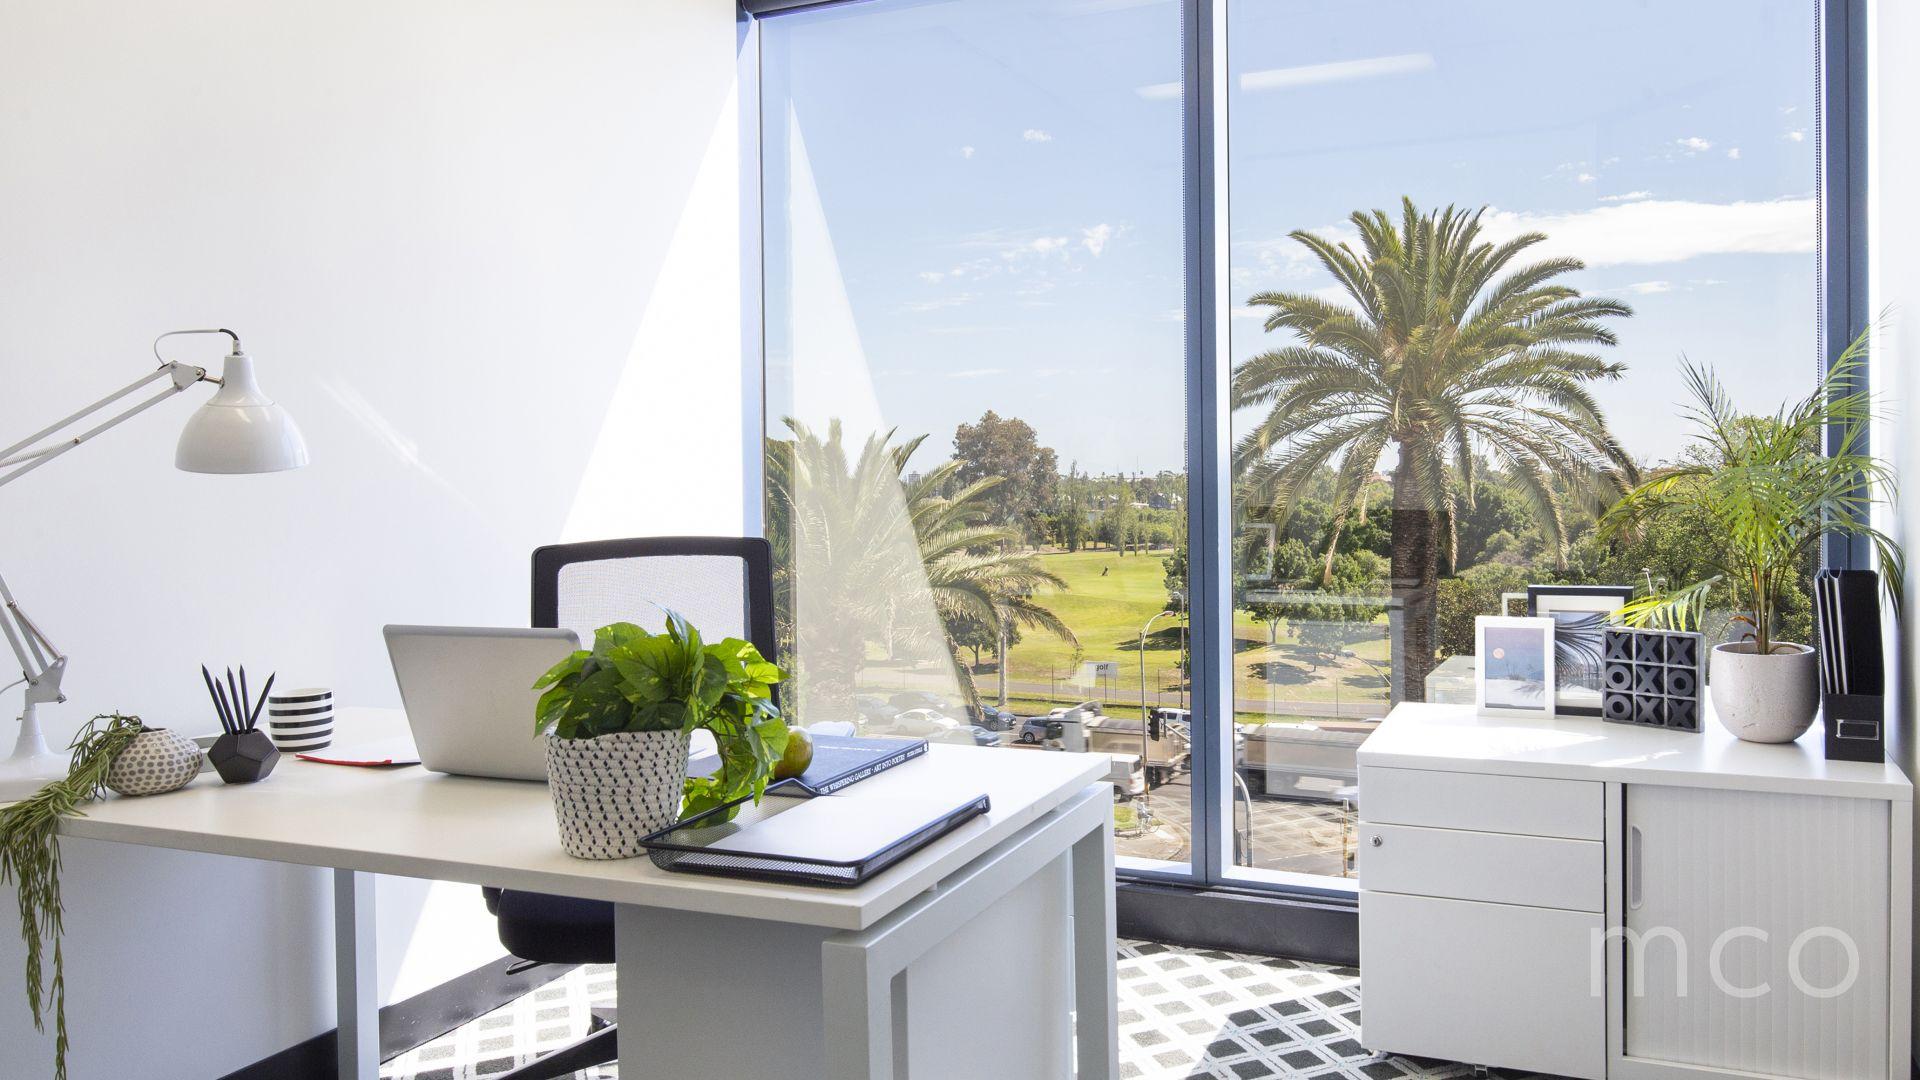 Premium office with impressive Albert Park views